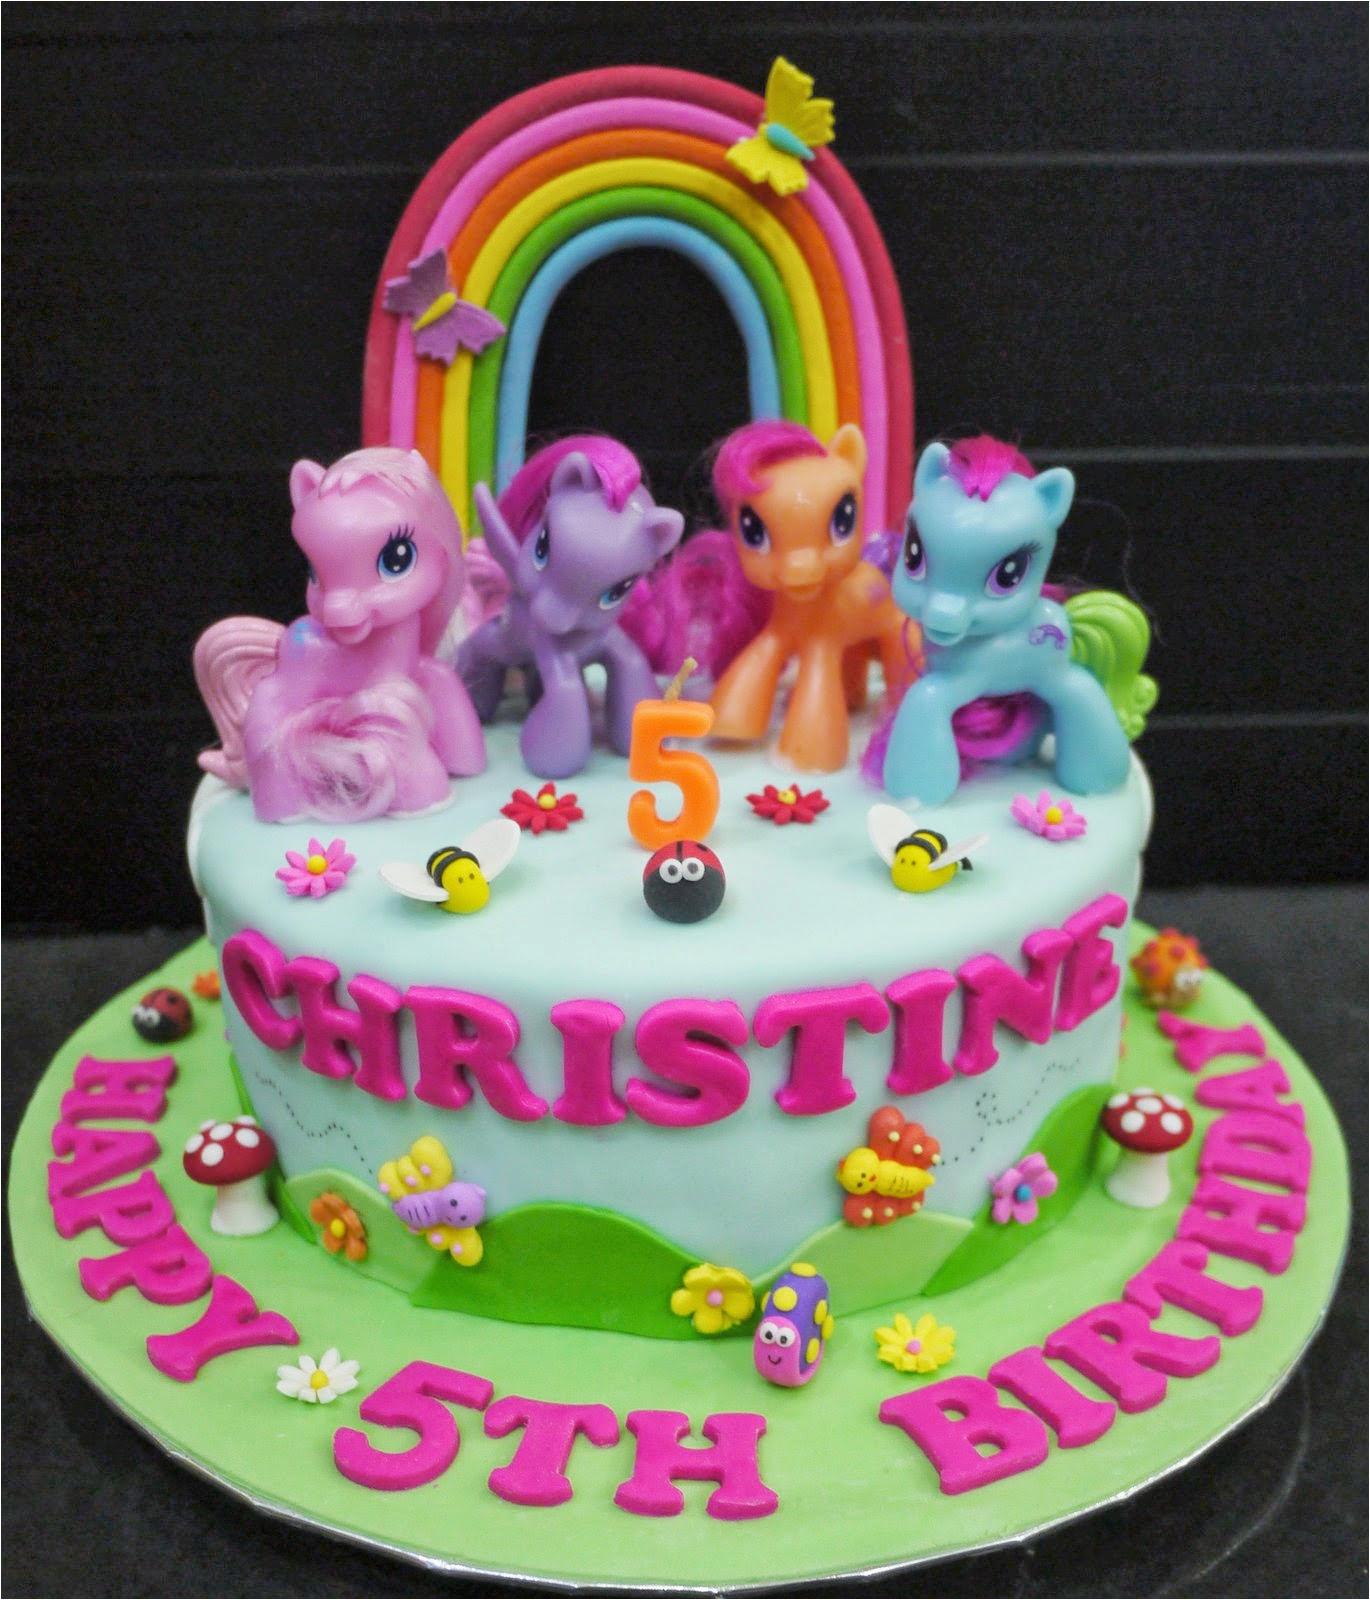 christines my little pony cake